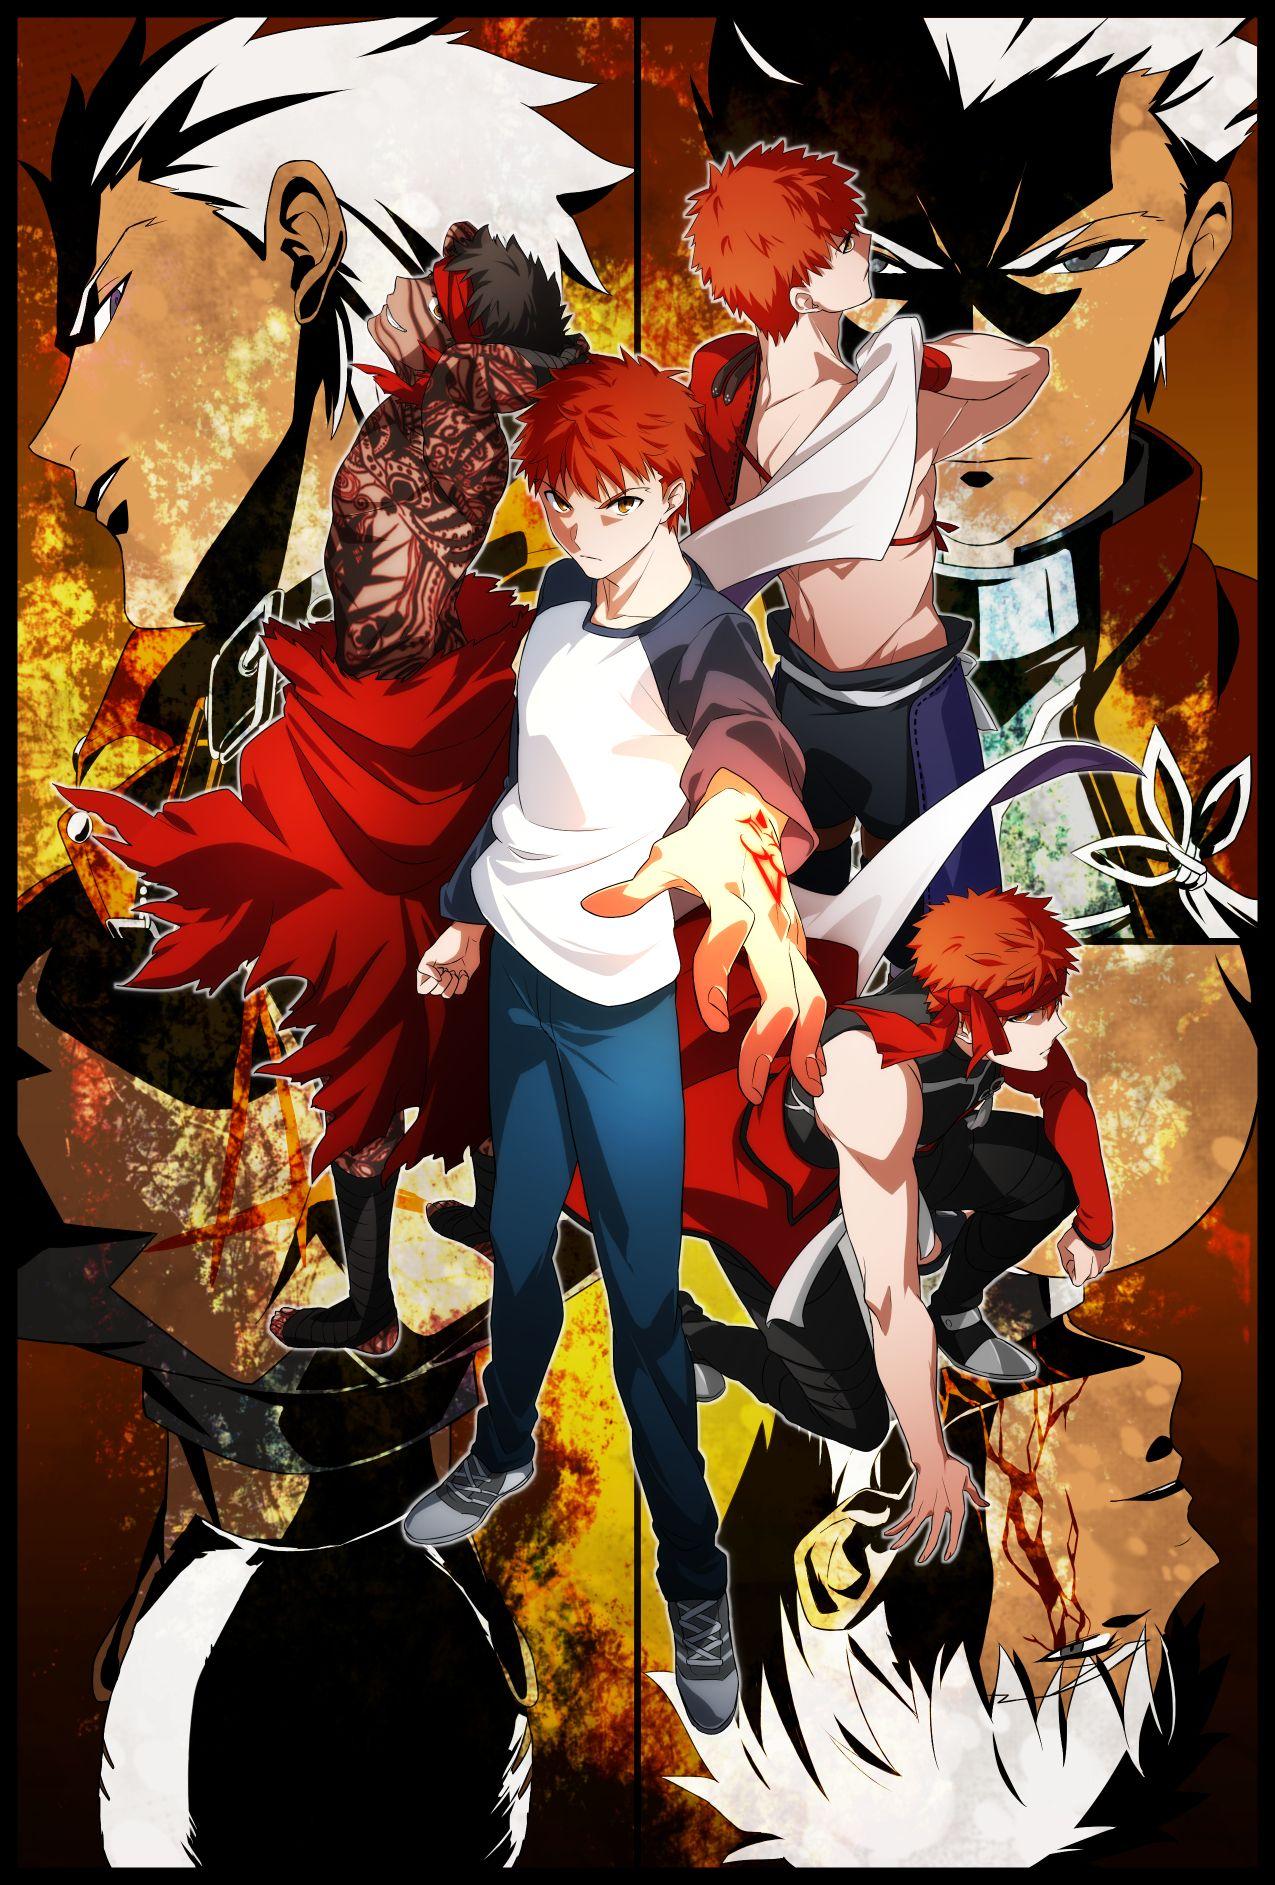 Pinterest Fate archer, Fate anime series, Anime